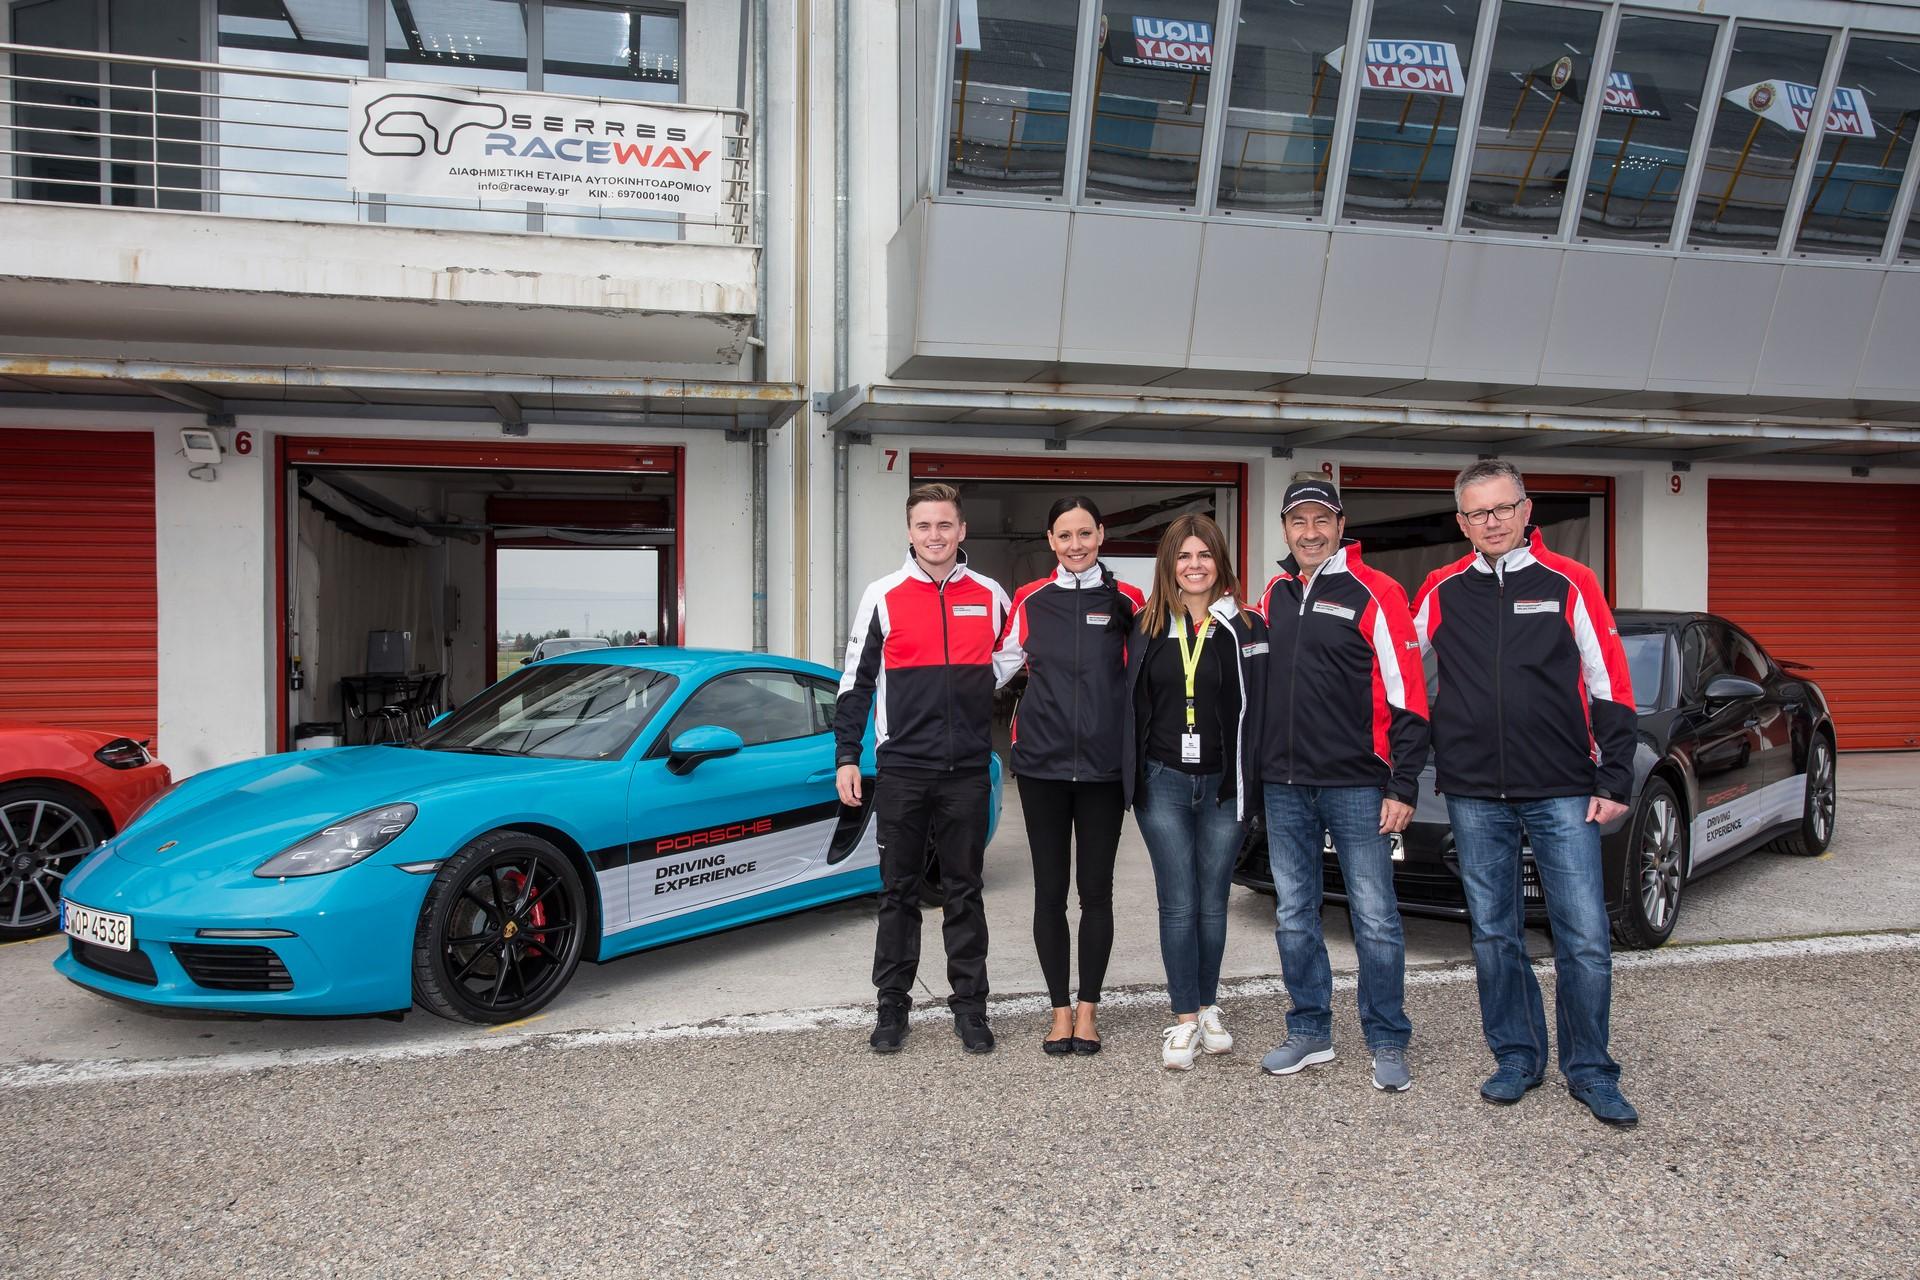 Porsche Driving Experience 2017 Serres (165)